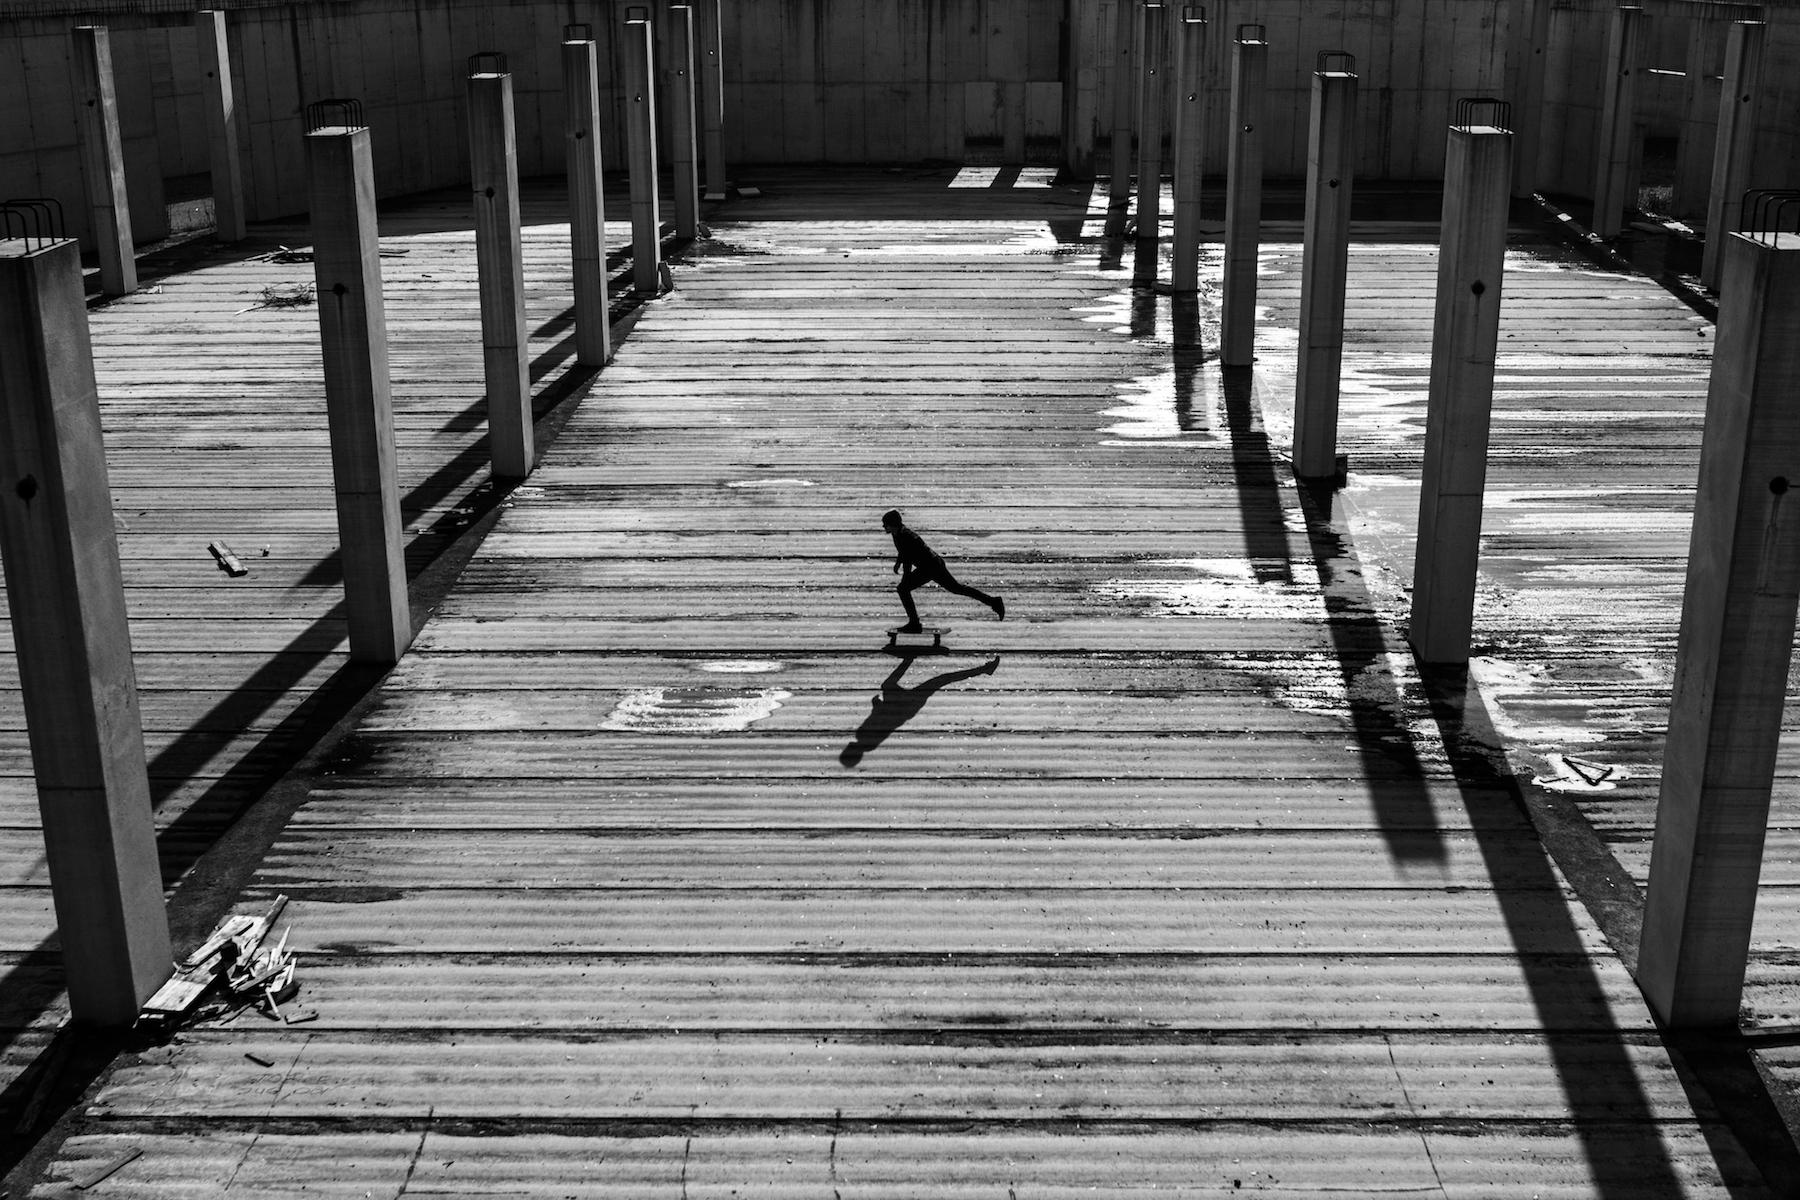 luke-paige-skate-photography-12